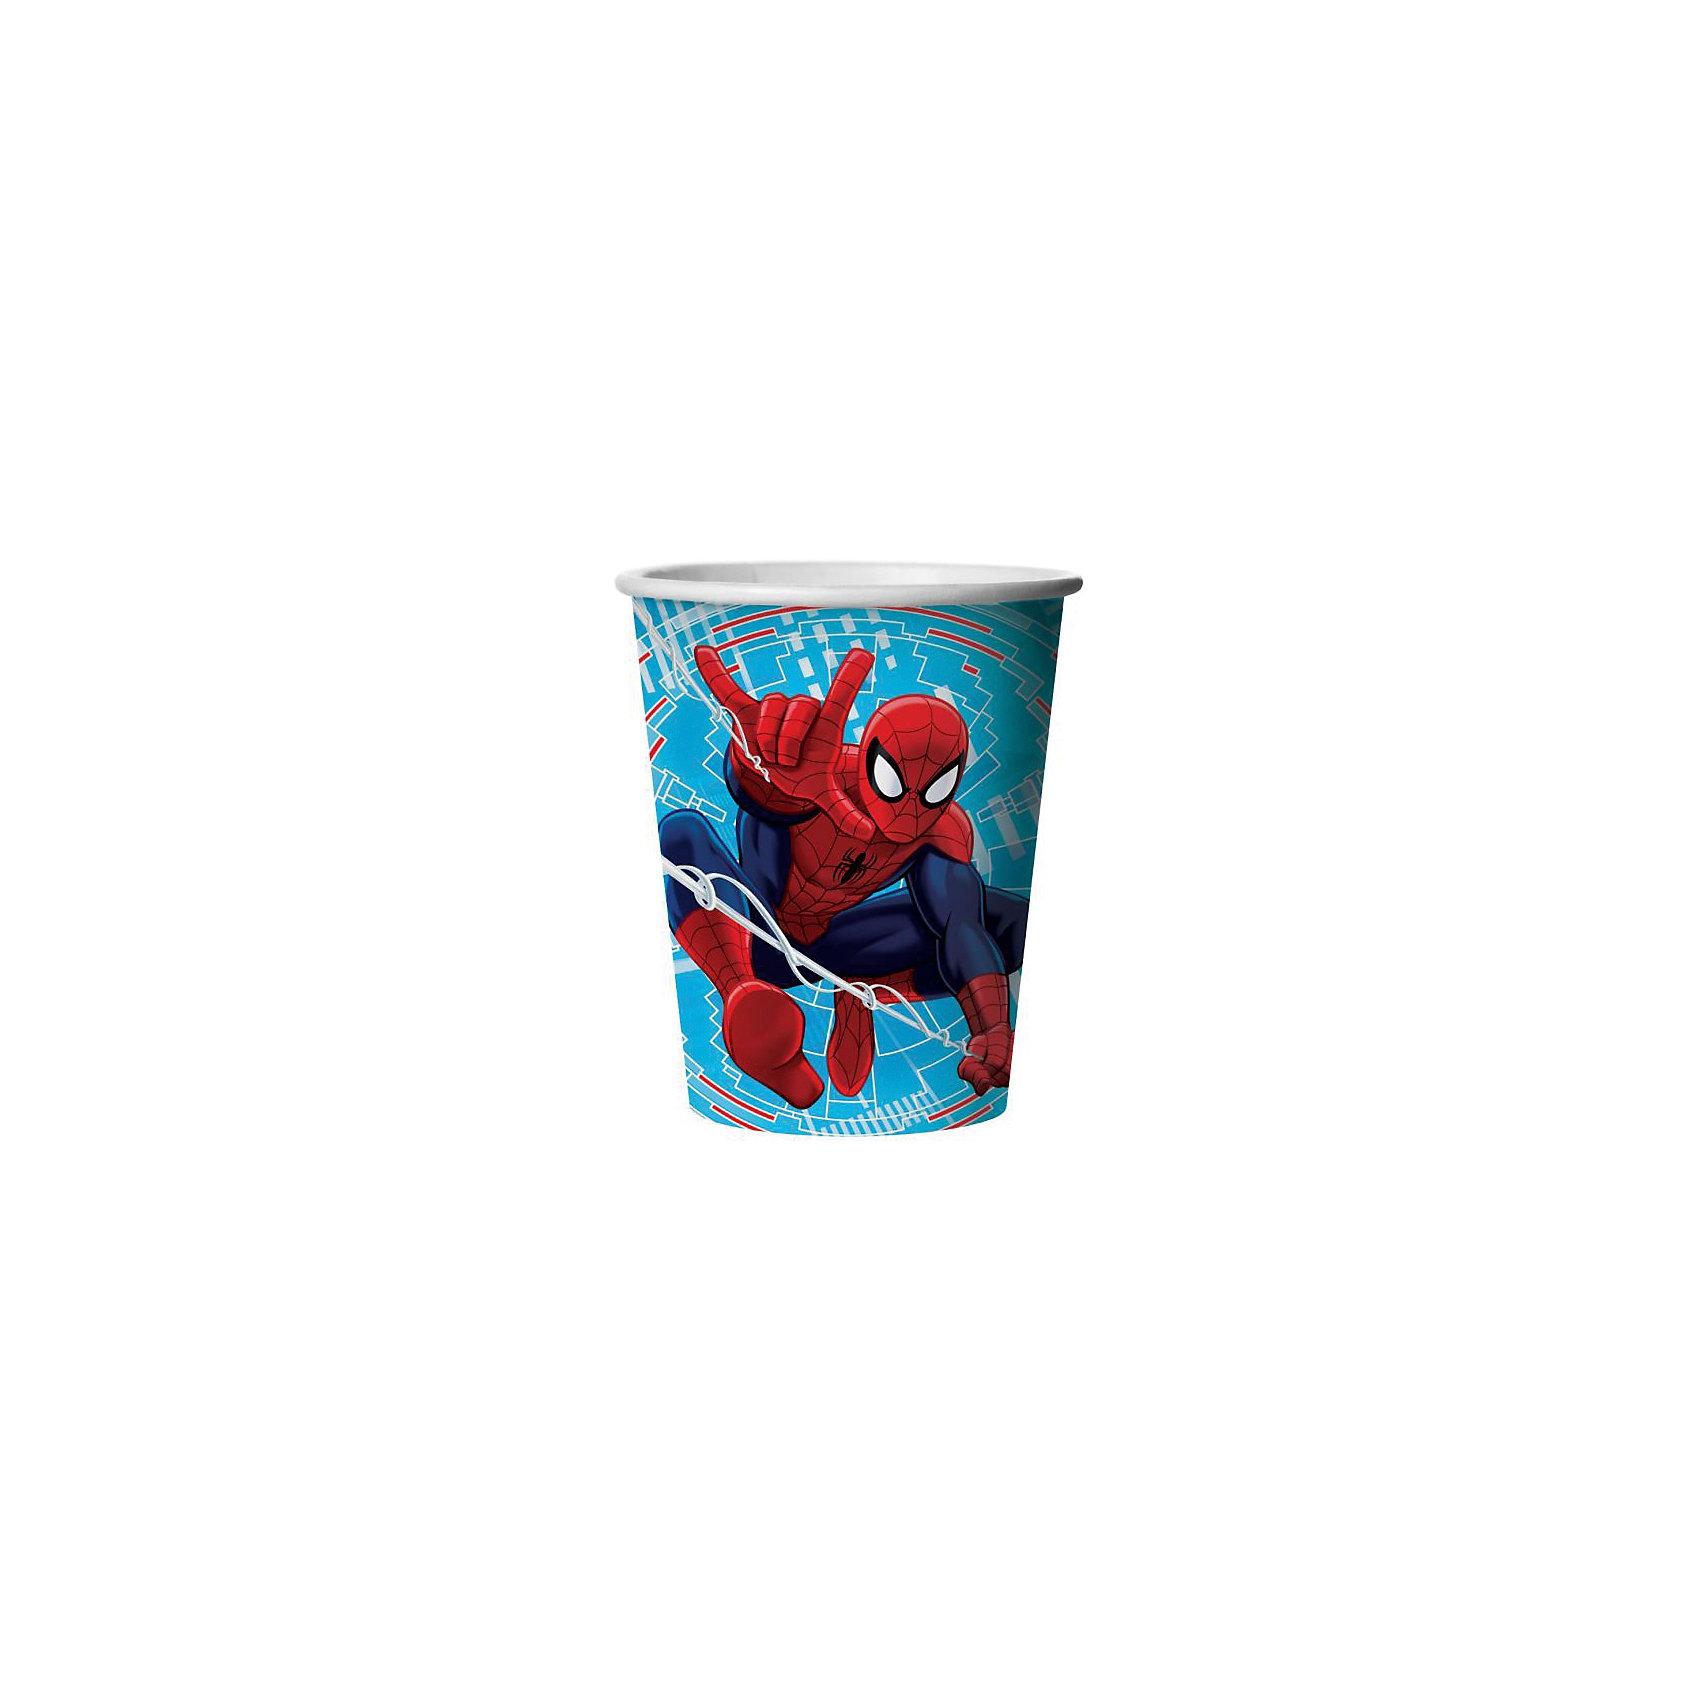 ������ �������� �������-����, 6 ���������� ��������  �������-���� (Spider-man), 6 ���� � ��� �������� ���������� �� ����������� ����� ������ ��������!<br>����� ������� ���������� � ������ ��� ����������, ���� ���� ��������� ��������� ������� ��������, � � �������� ��� � ���� �� ����������. ��������� ����������� ��������-����� ������ ������� ��������� ��������� ��������� ���������� ��� ���������� ���������� ������������ � �������� � �������, ������� ������ � �������������. ����� ����������� ������� ����� ��������! ���������� ������ ����� ������� ���� � ��������� �����. ����������� �� ����������� ��� ����� ���������. � ����� �������� ����� ����� ������������� ���������� �������� � �������� �� ���� �����.<br><br>�������������� ����������:<br><br>- � ������: 6 ��.<br>- ��������: ������<br>- ������ ��������: 13 � 8 � 22 ��.<br><br>������ ��������  �������-���� (Spider-man), 6 ���� ����� ������ � ����� ��������-��������.<br><br>������ ��: 130<br>������� ��: 80<br>������ ��: 220<br>��� �: 60<br>������� �� �������: 24<br>������� �� �������: 144<br>���: �������<br>�������: �������<br>SKU: 4254586